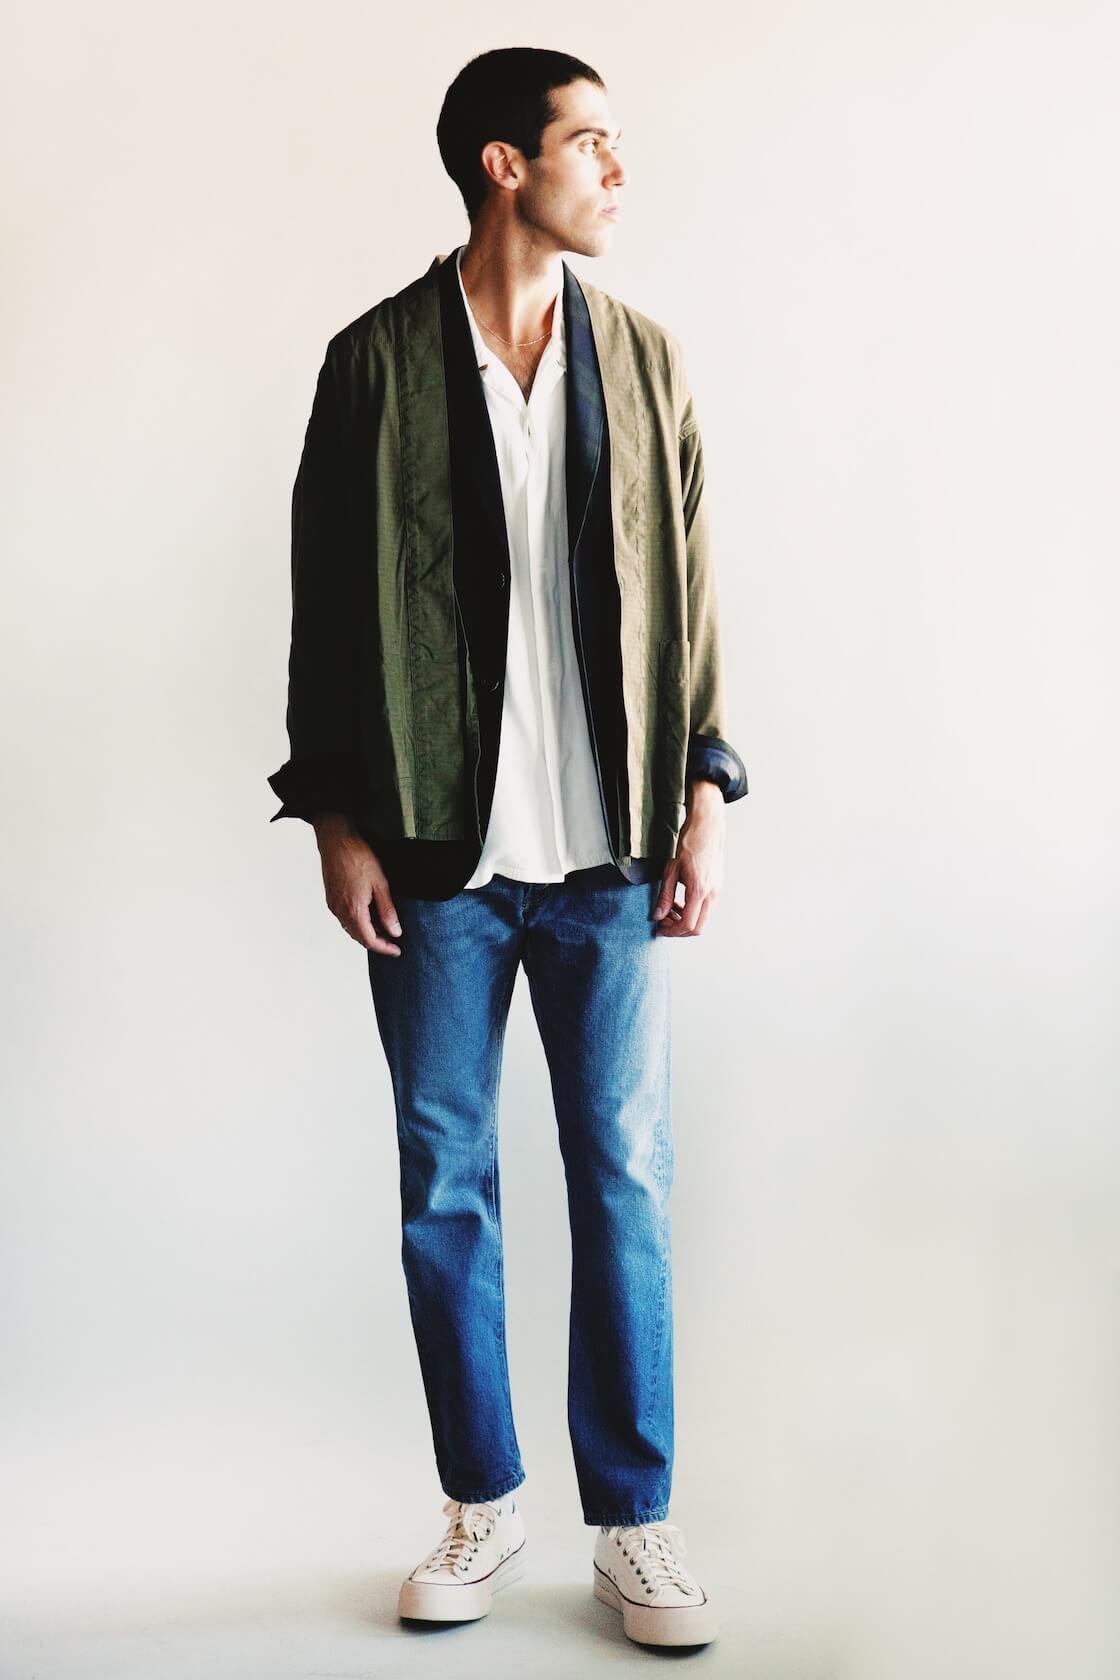 visvim lhamo shirt mil, beams plus flannel jacket, orslow 107 ivy denim and visvim skagway lo canvas shoes on body